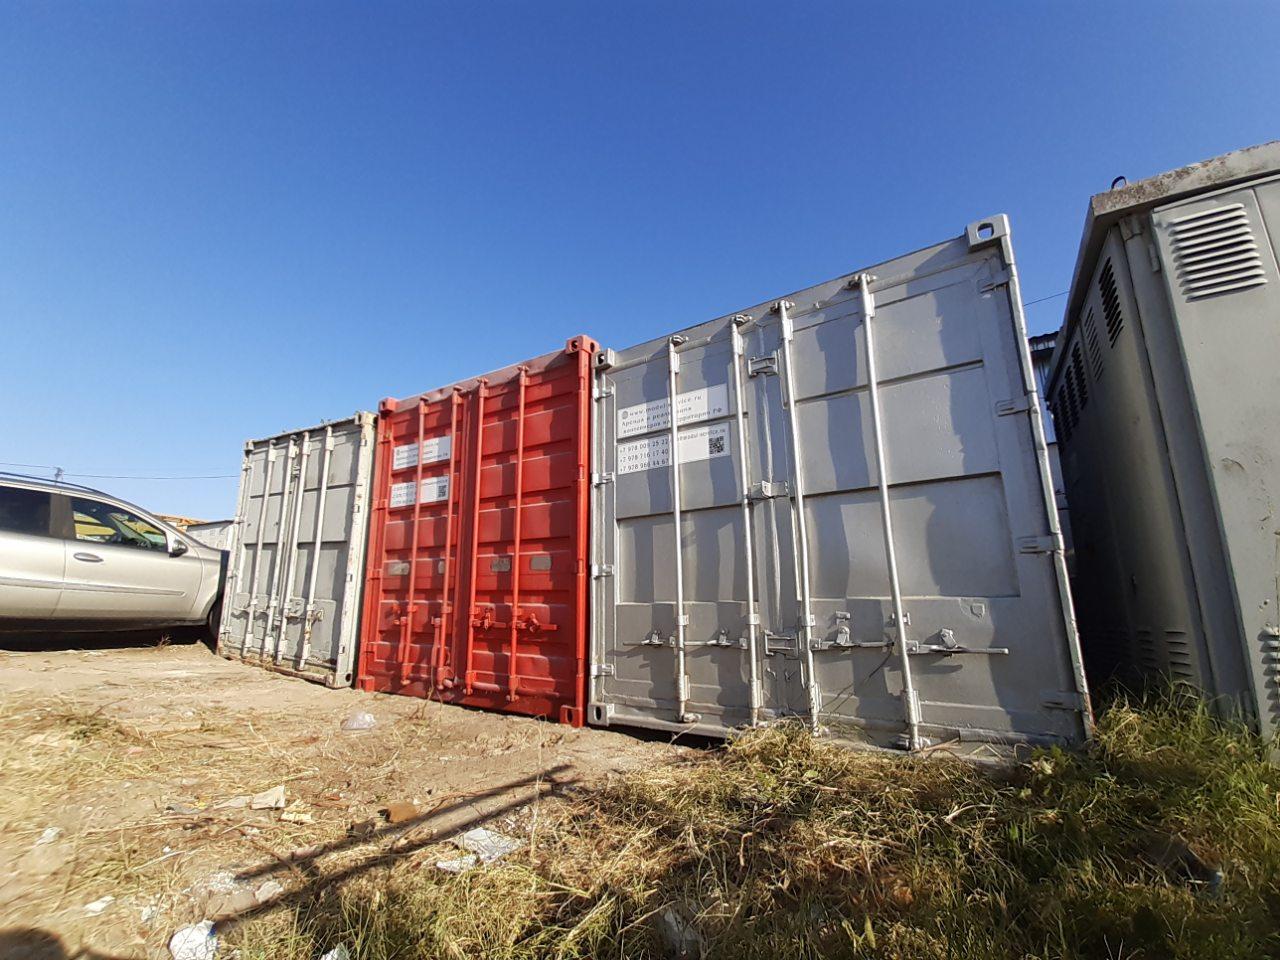 kupit-morskoj-kontejner